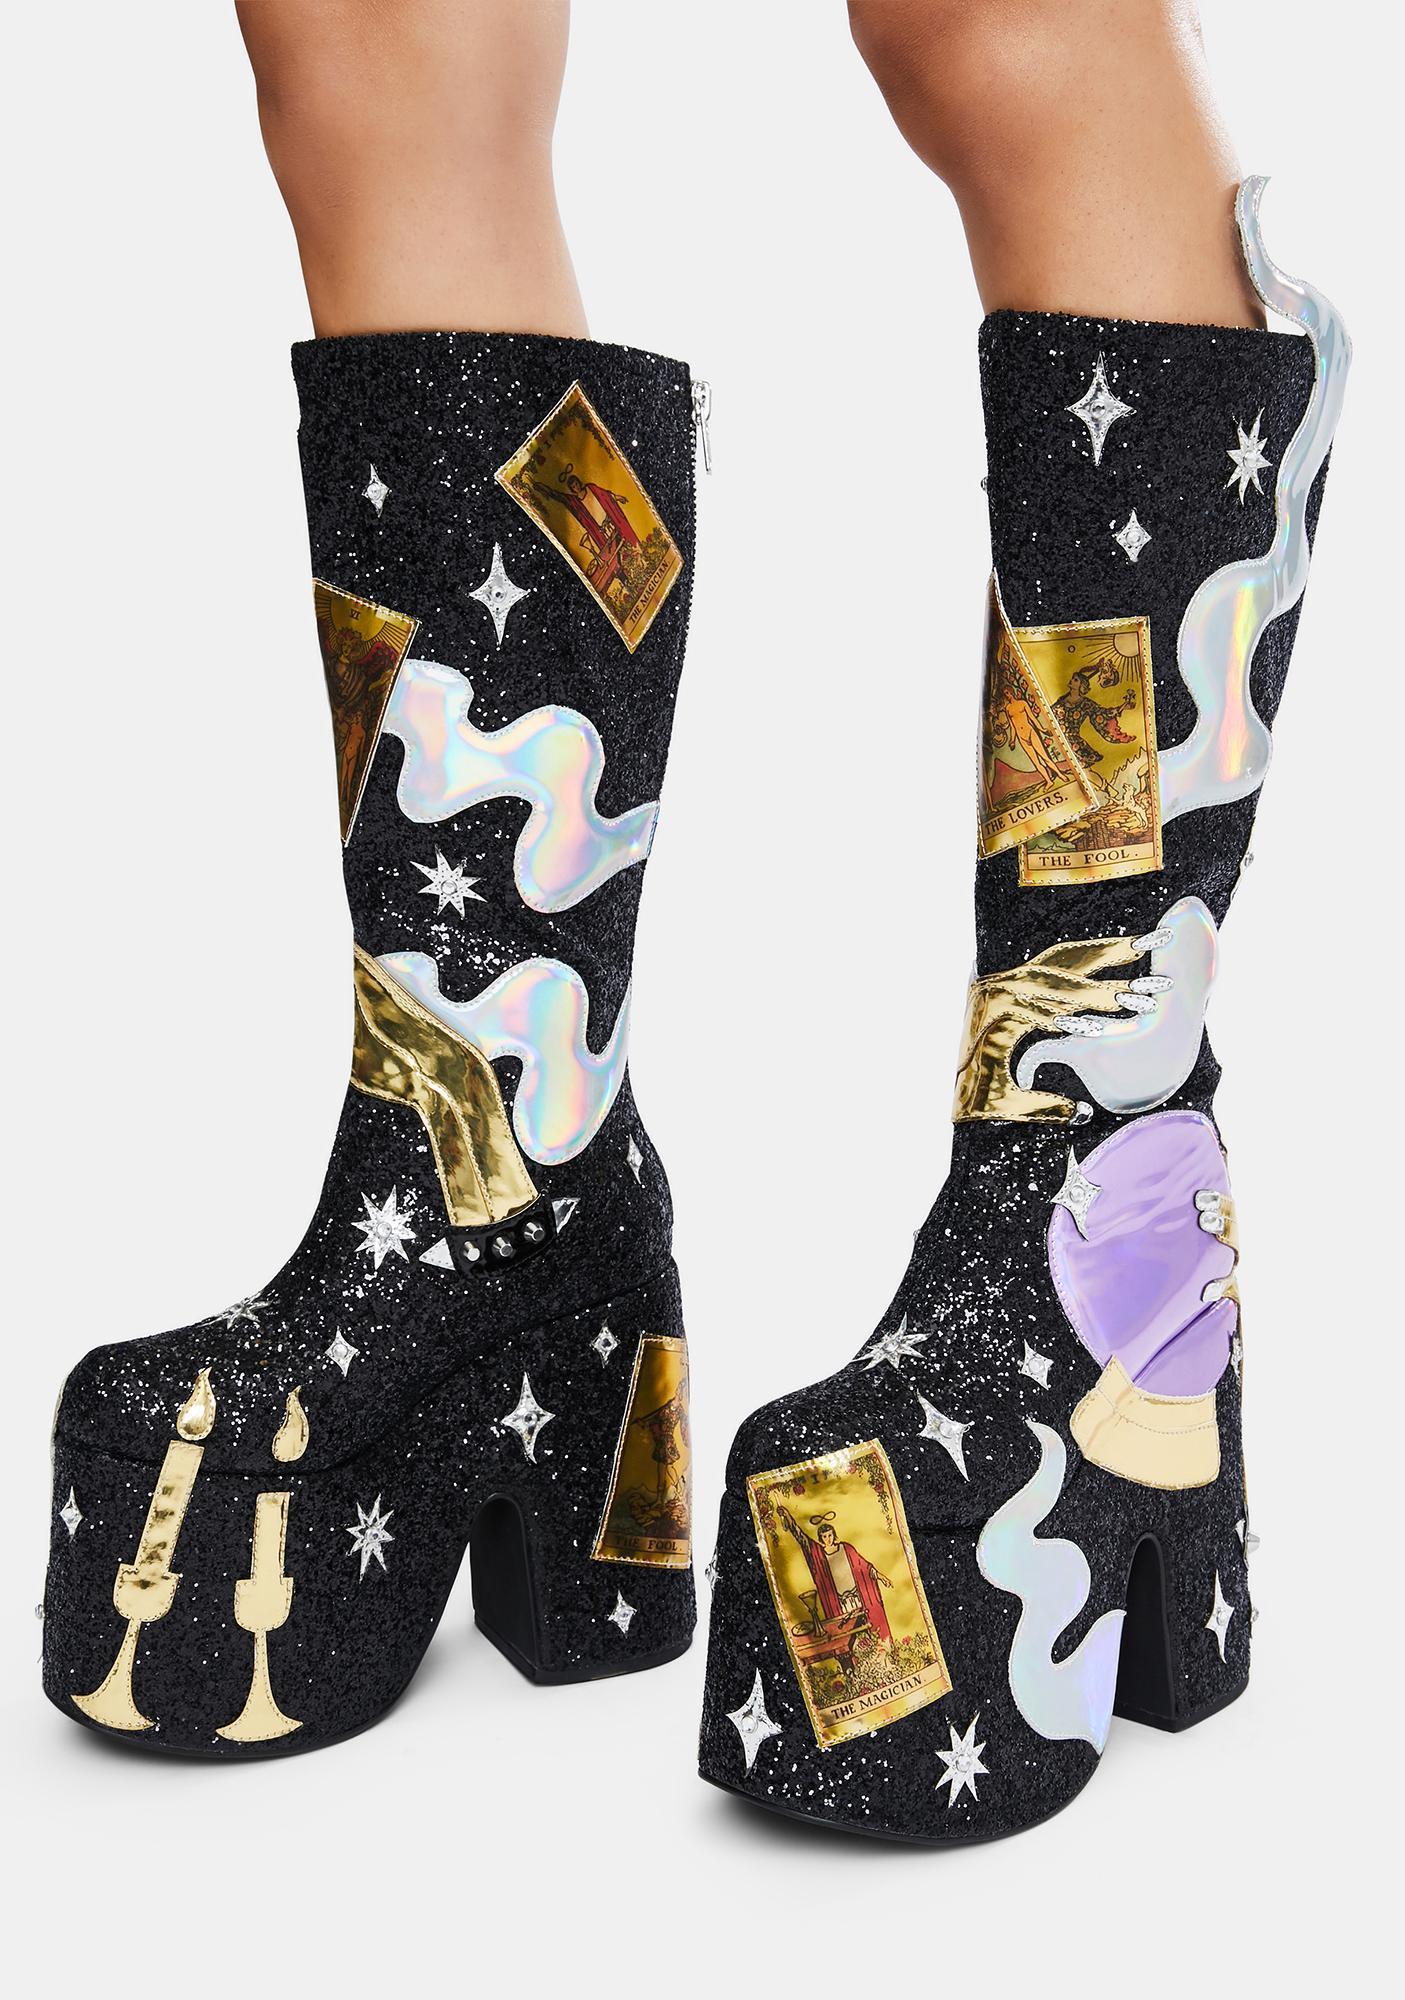 Club Exx Cosmic Fortune Platform Boots